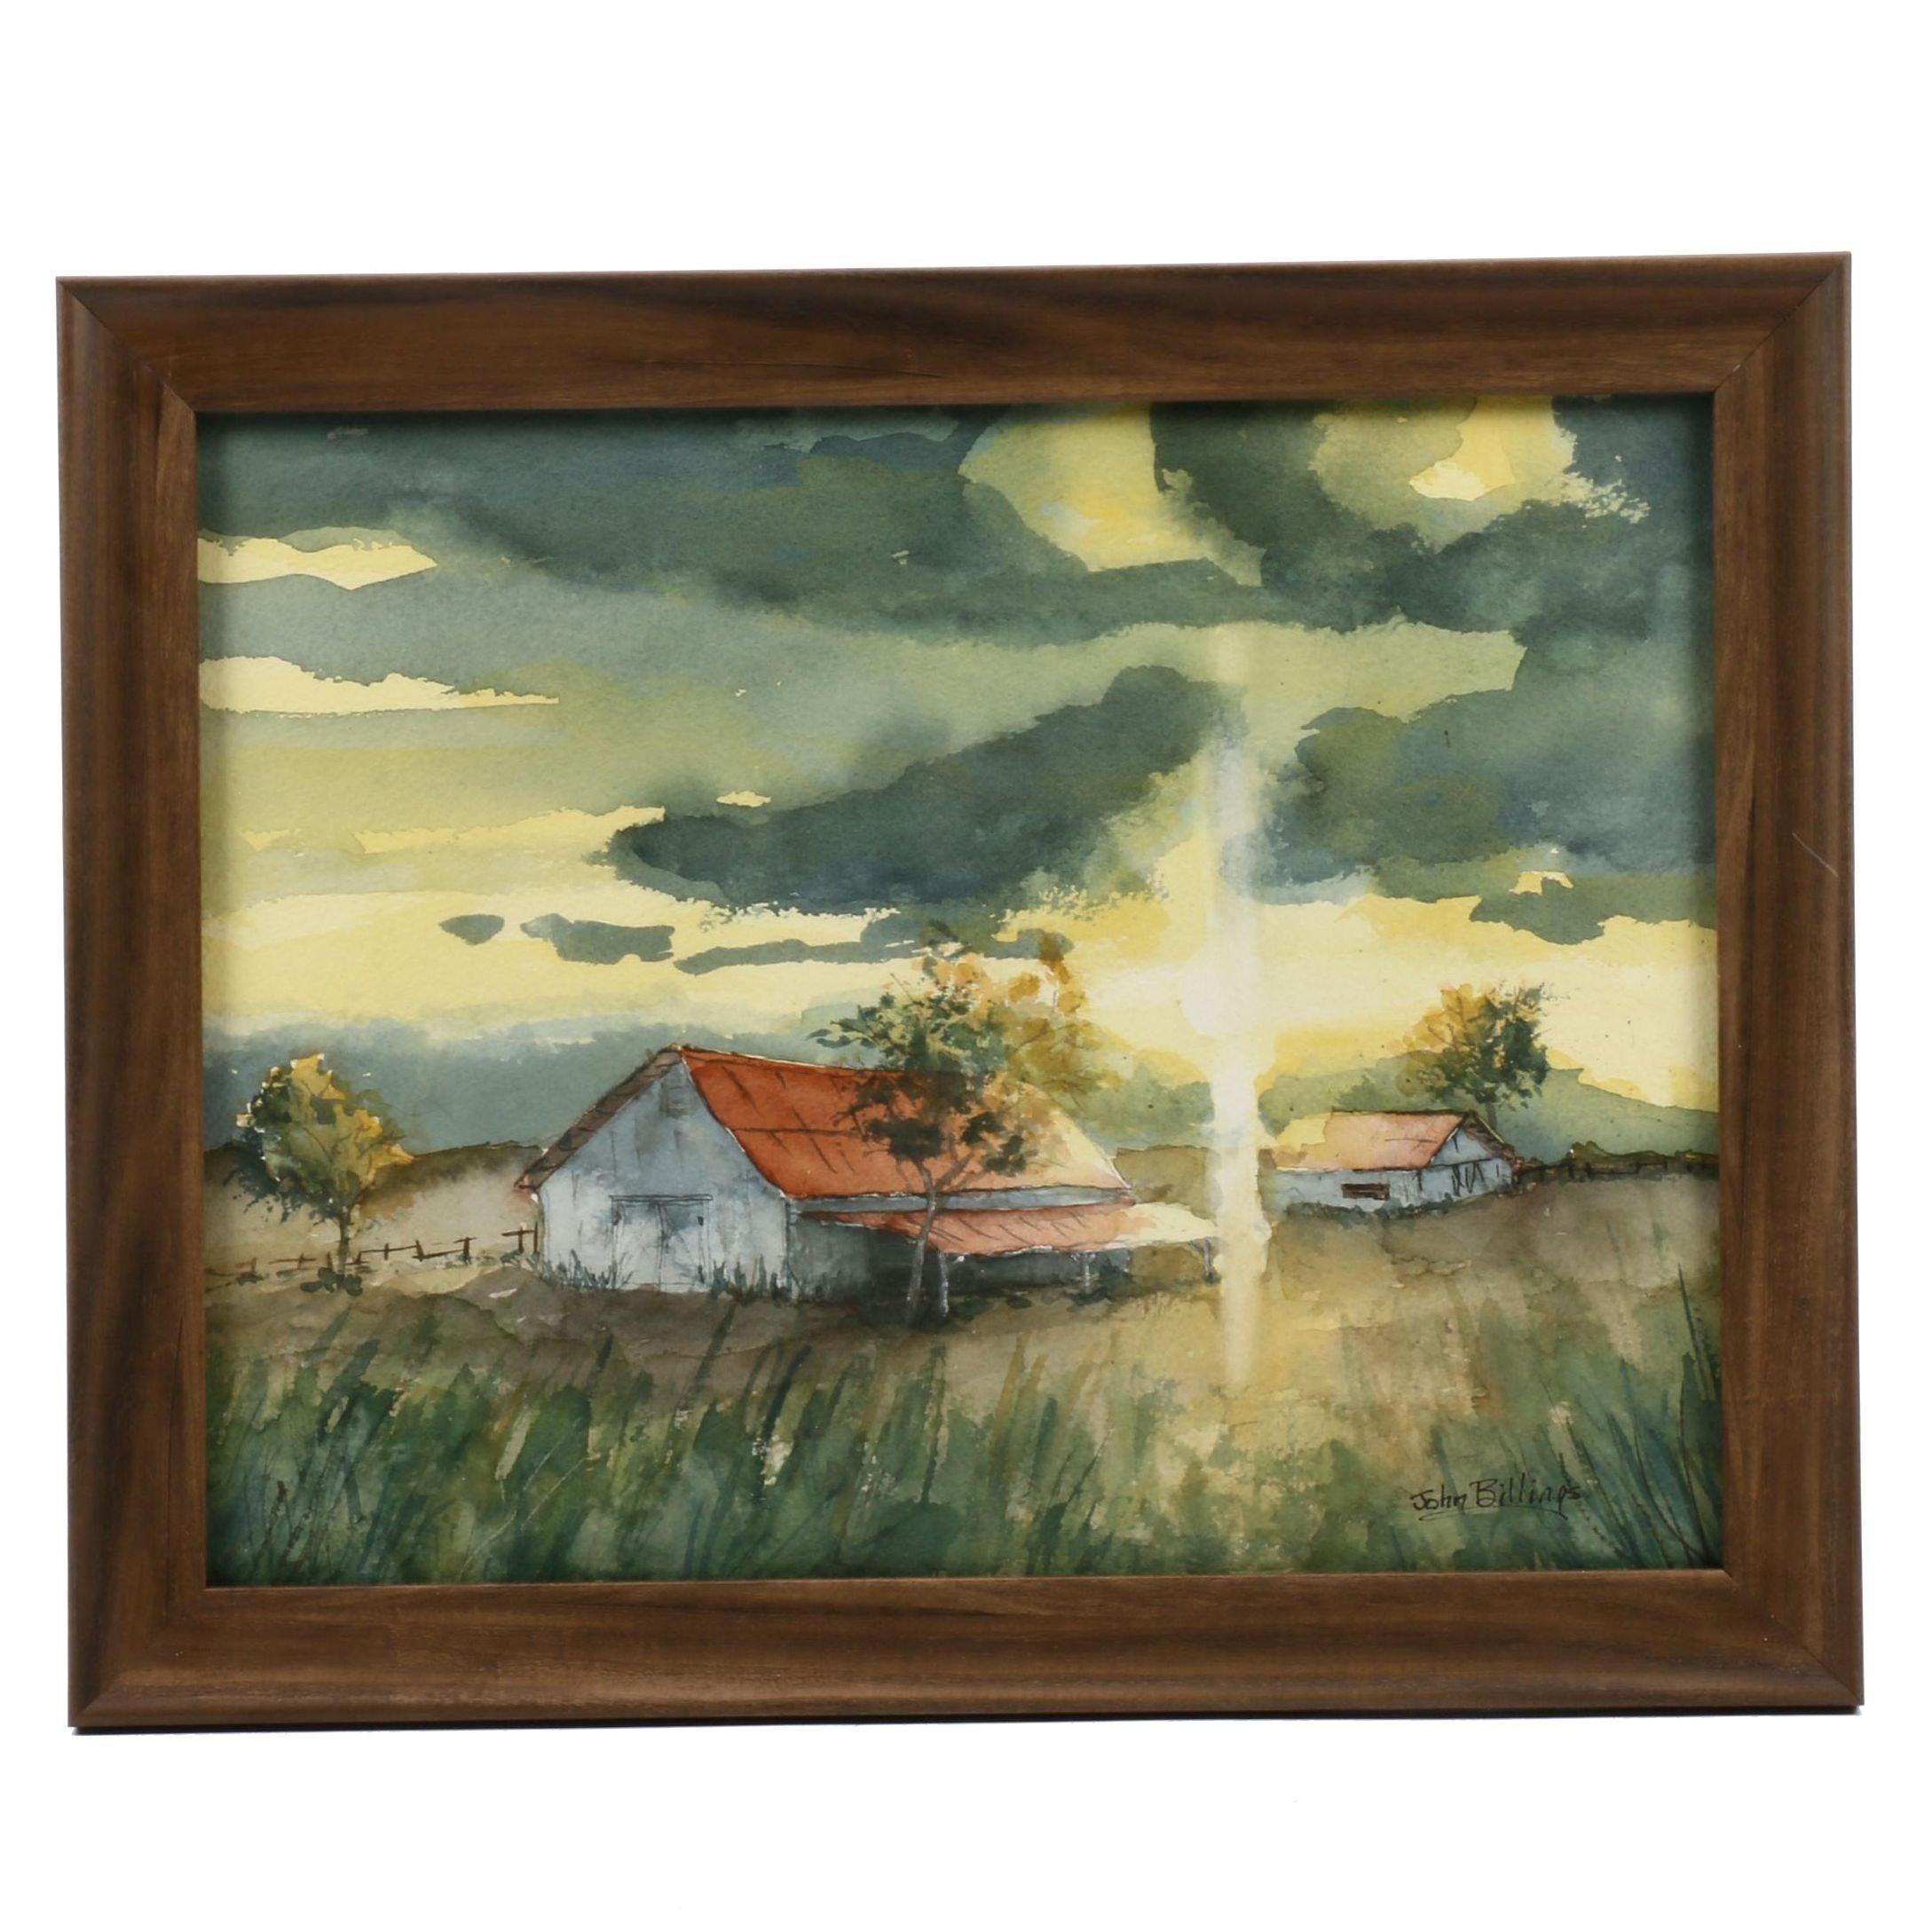 John Billings Watercolor Painting of Barn at Sunset